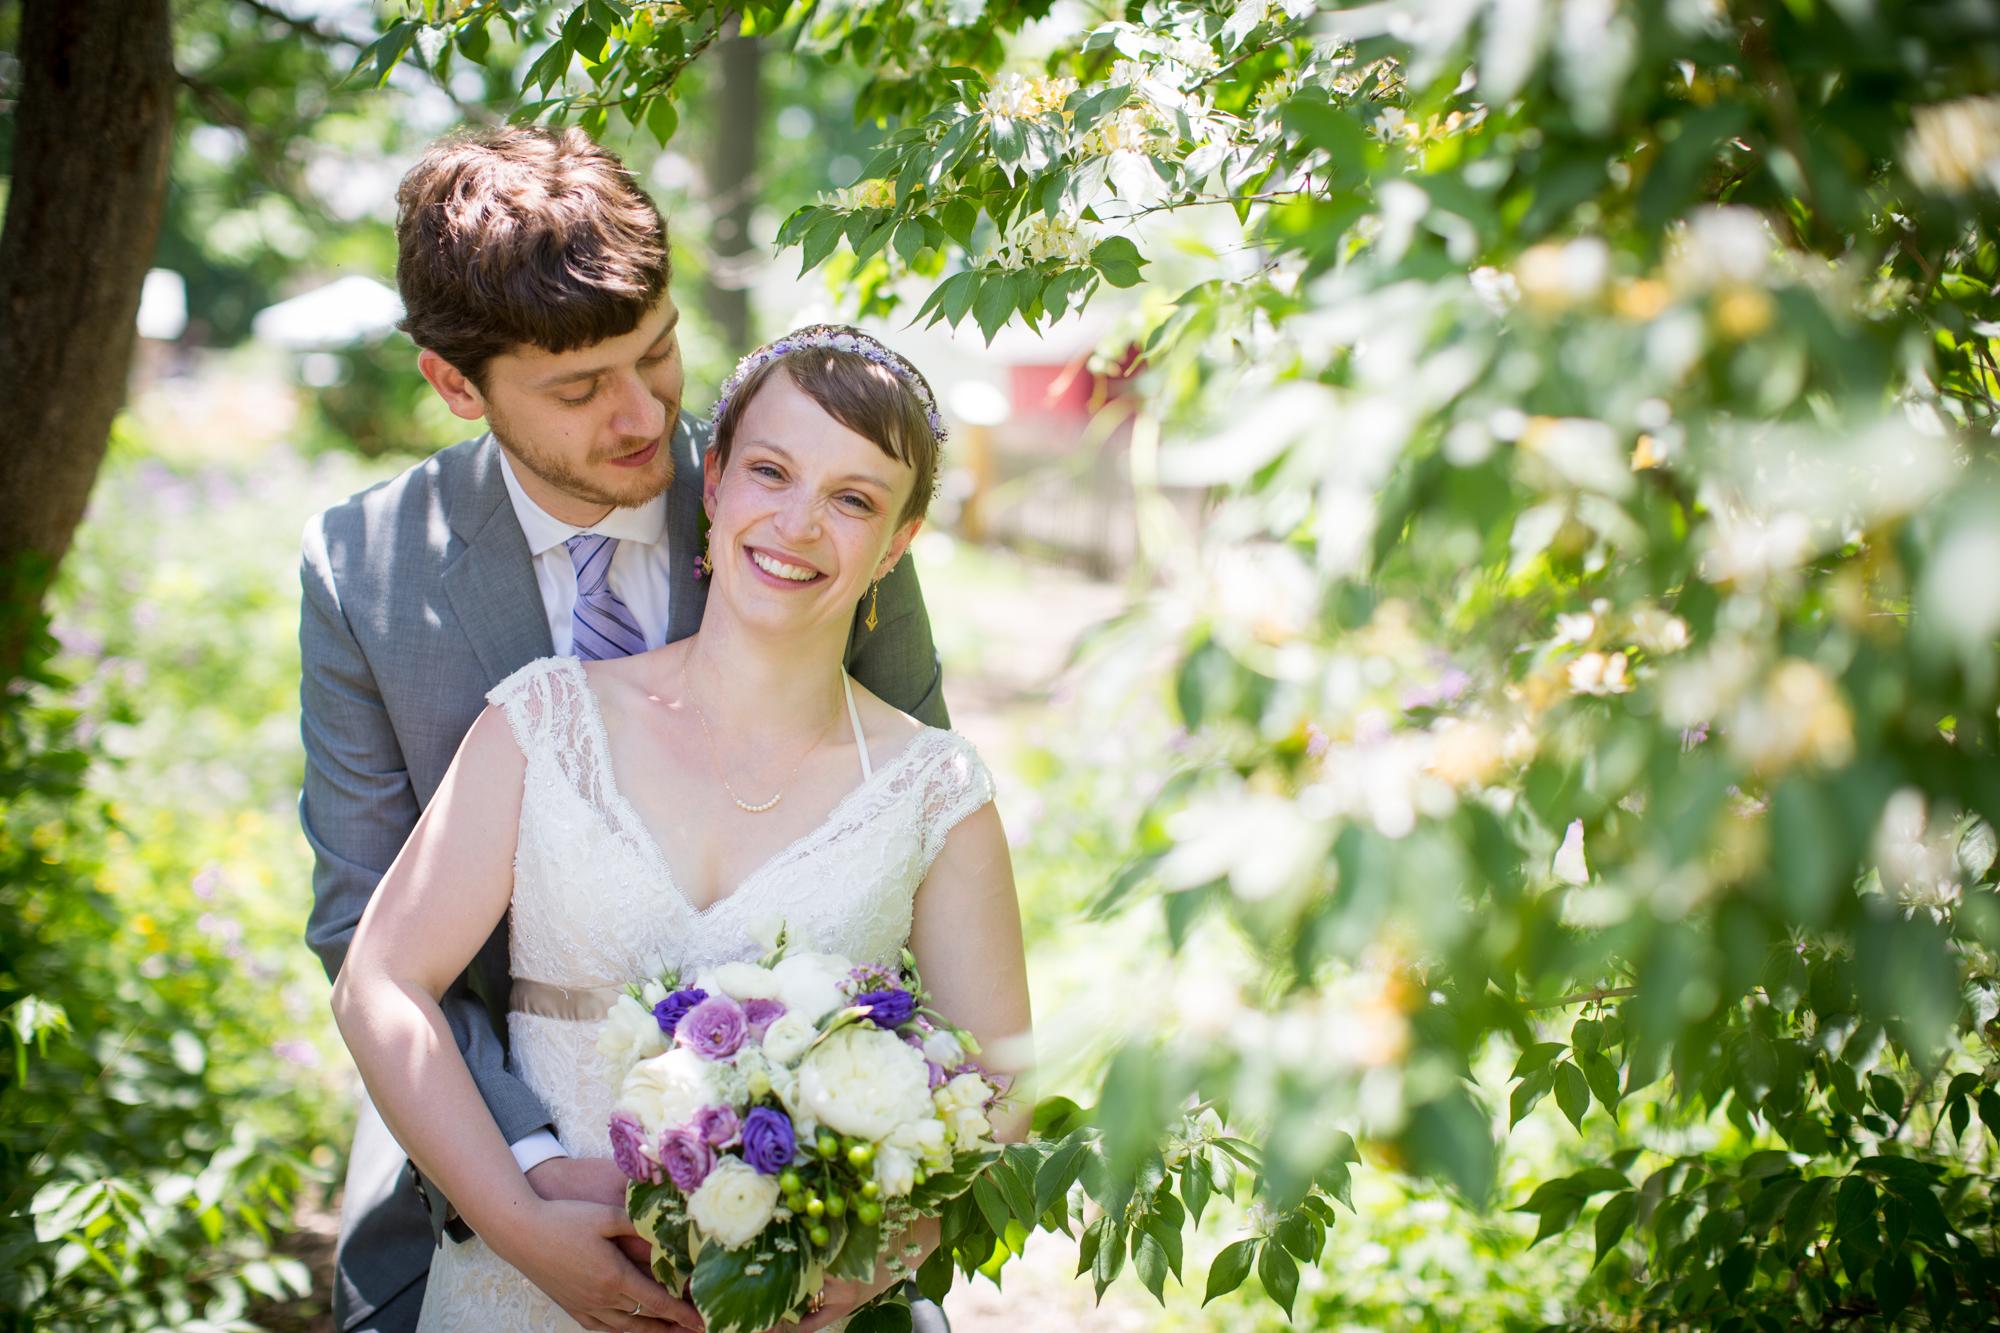 bride and groom posing for wedding photos